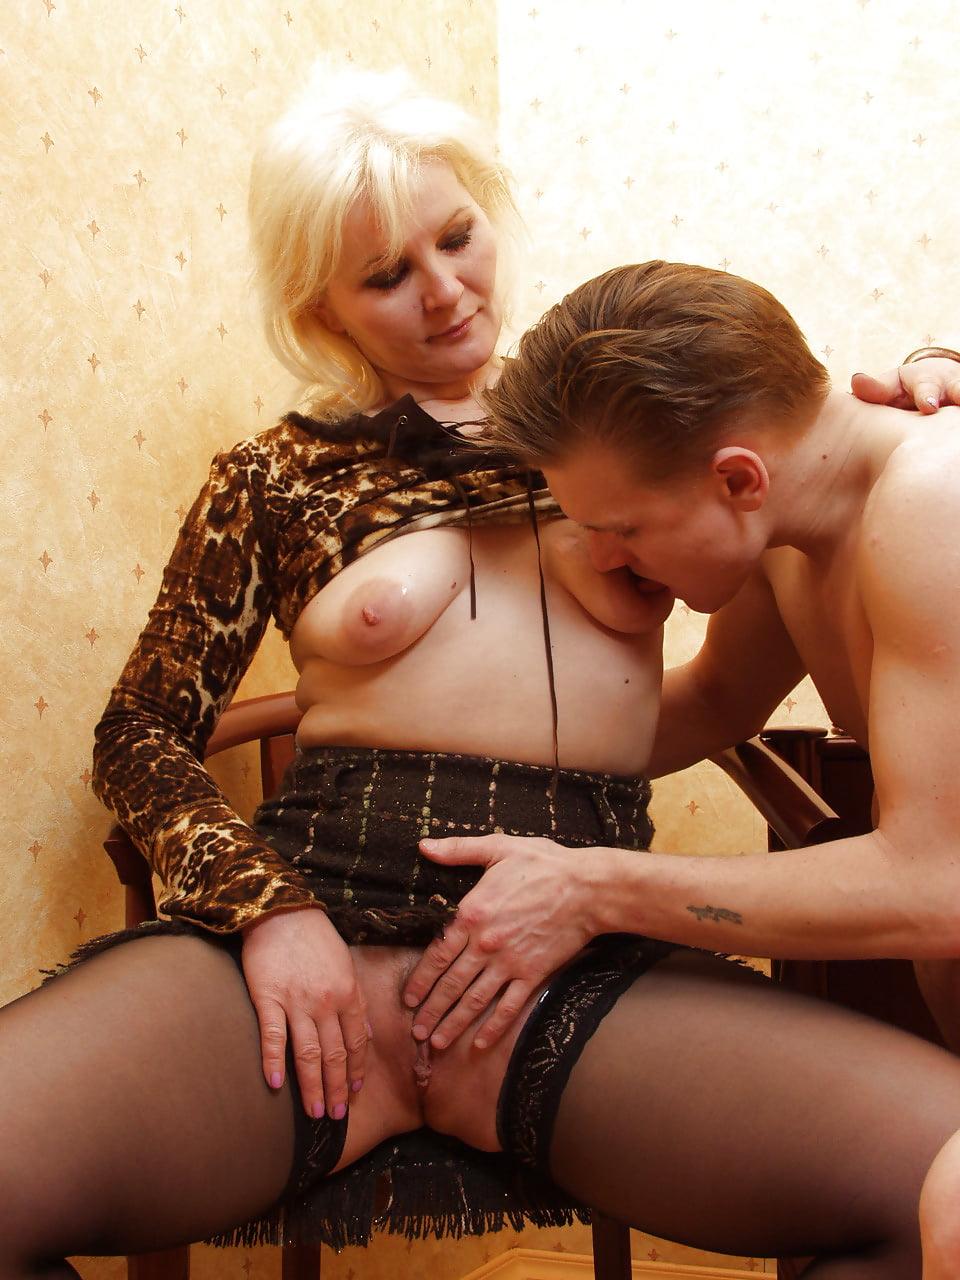 Зачетная мамка секс фото